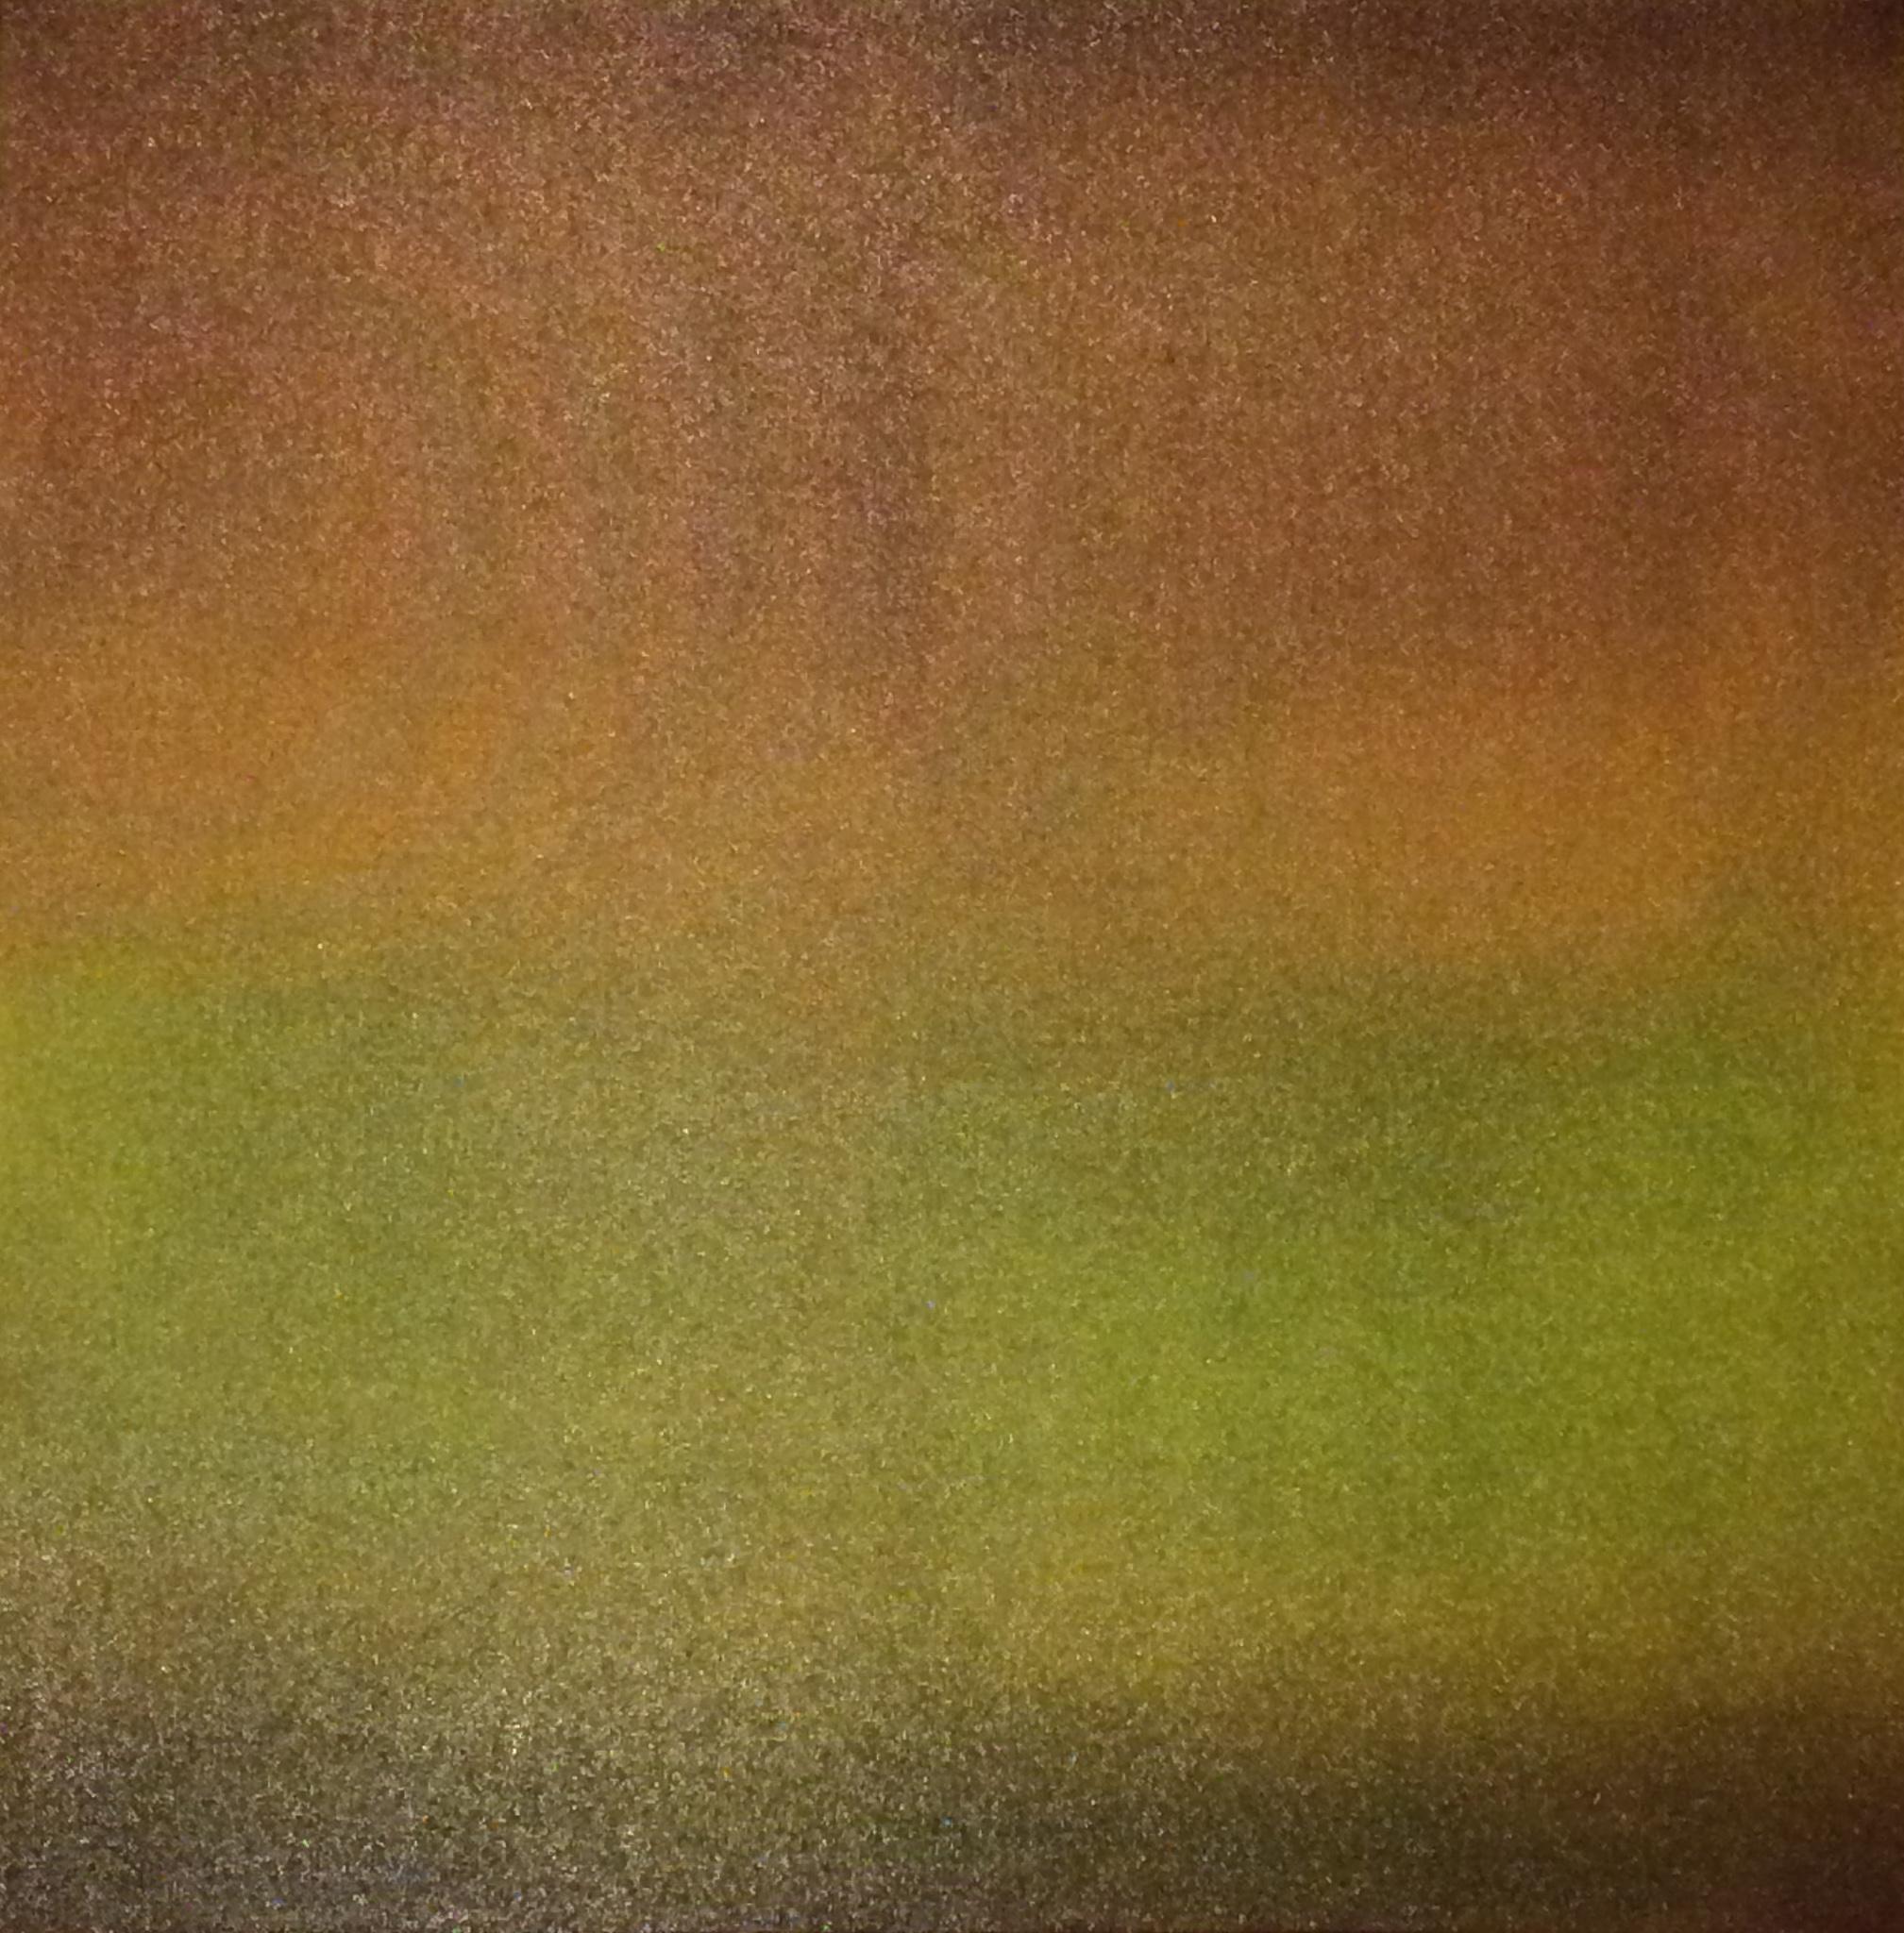 brown_green_middle.jpg